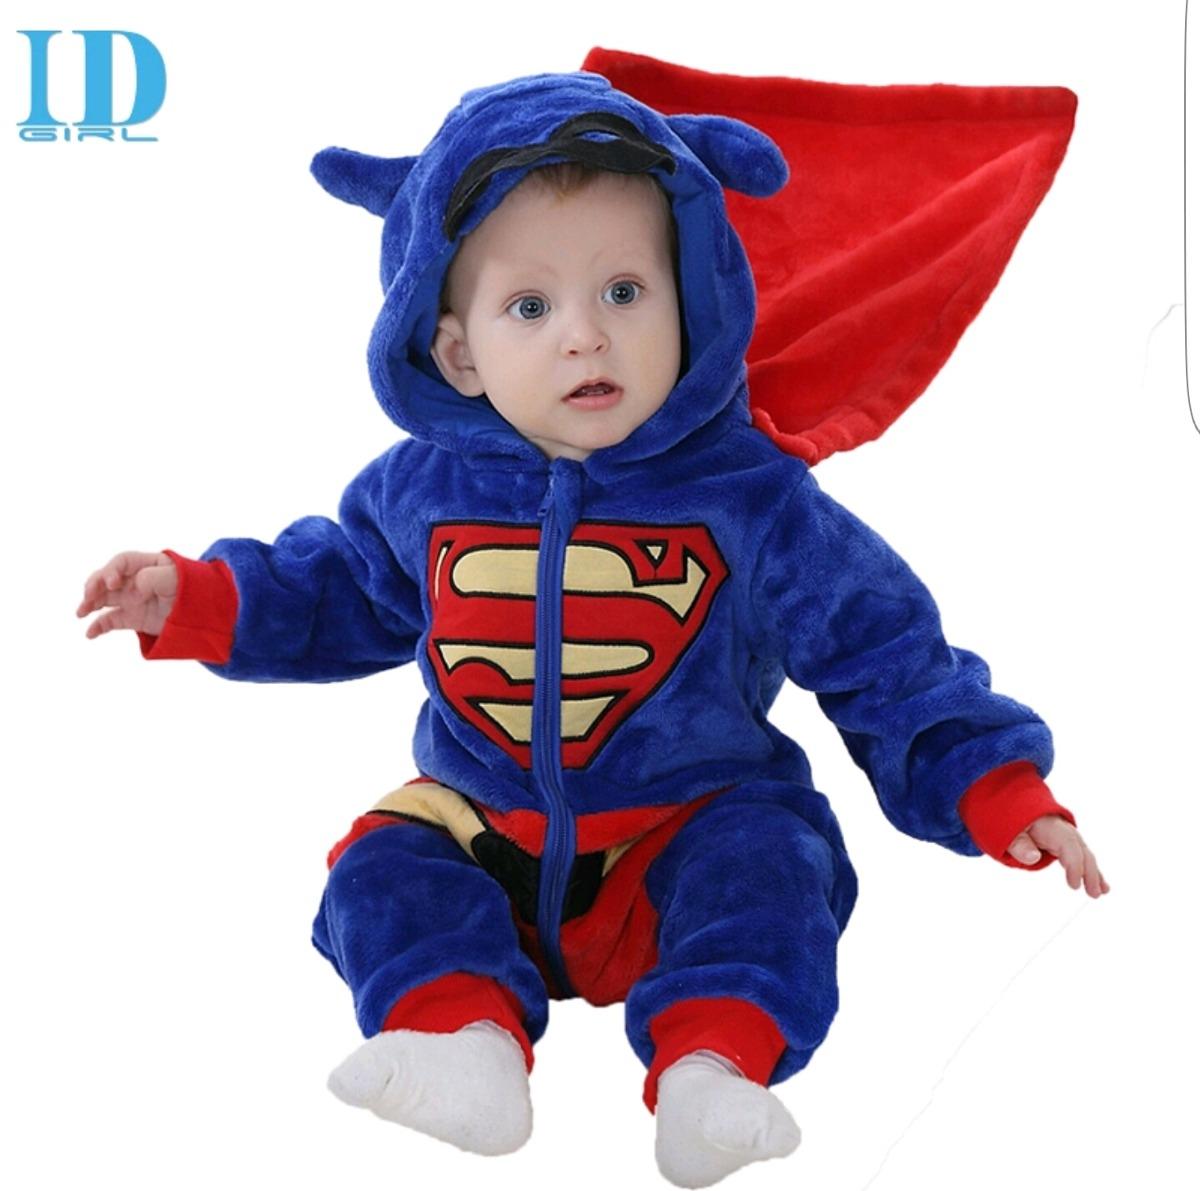 dd8c70b9cc roupa bebê 6 meses super homem superman fantasia herói. Carregando zoom.